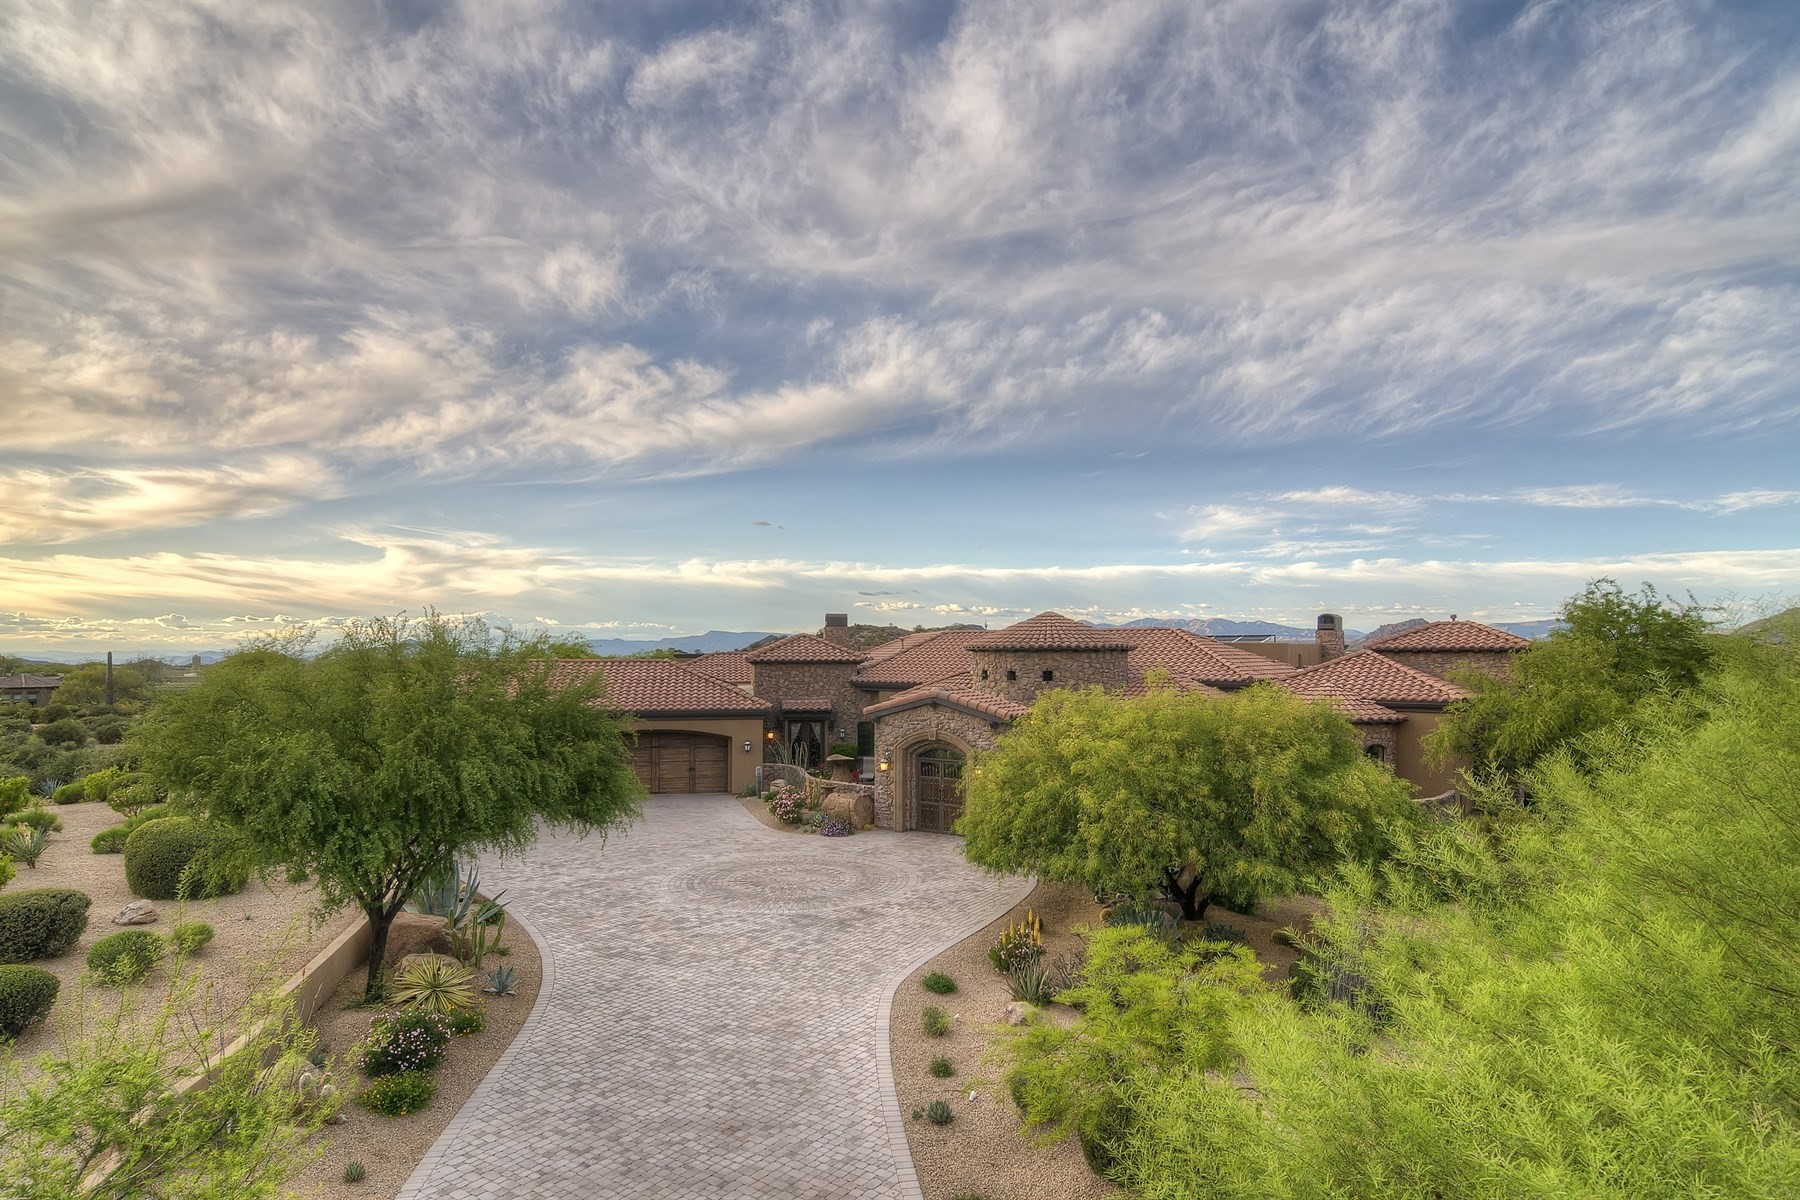 独户住宅 为 销售 在 Nothing Short of a Great Deal! 26868 N 117th Pl 斯科茨代尔, 亚利桑那州, 85262 美国